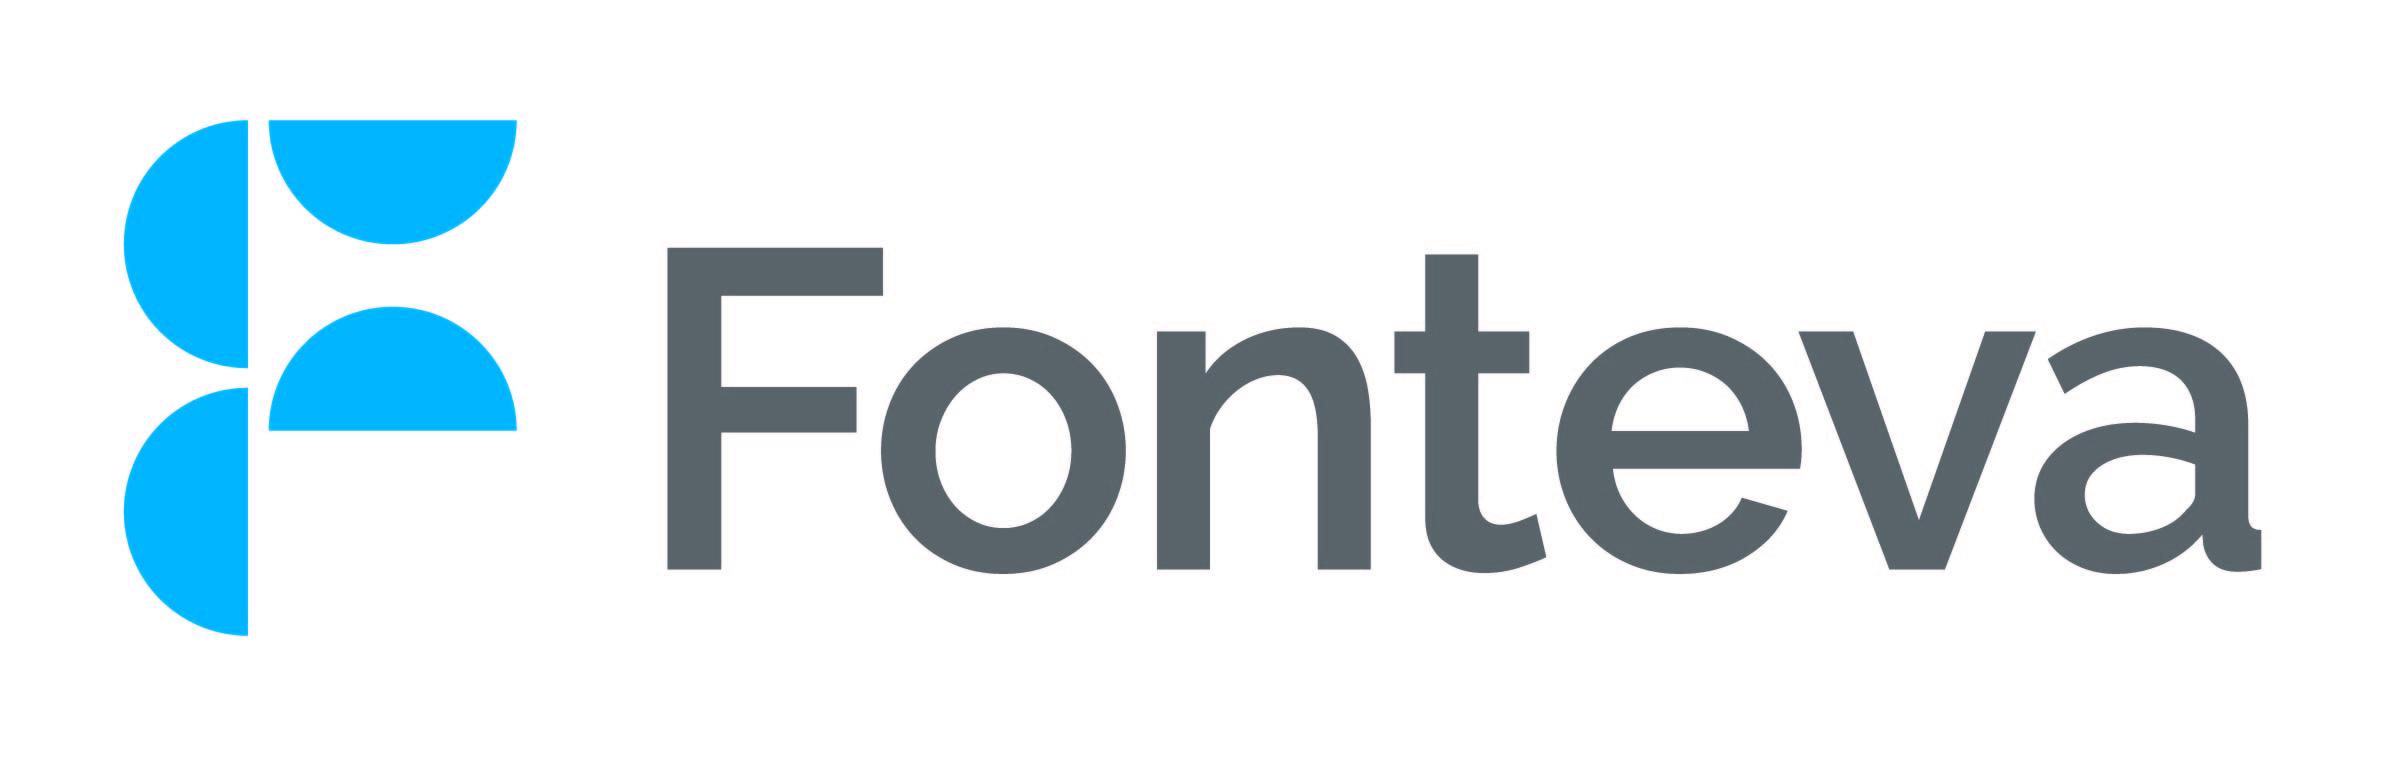 FONTEVA_LOGO_2017.jpg